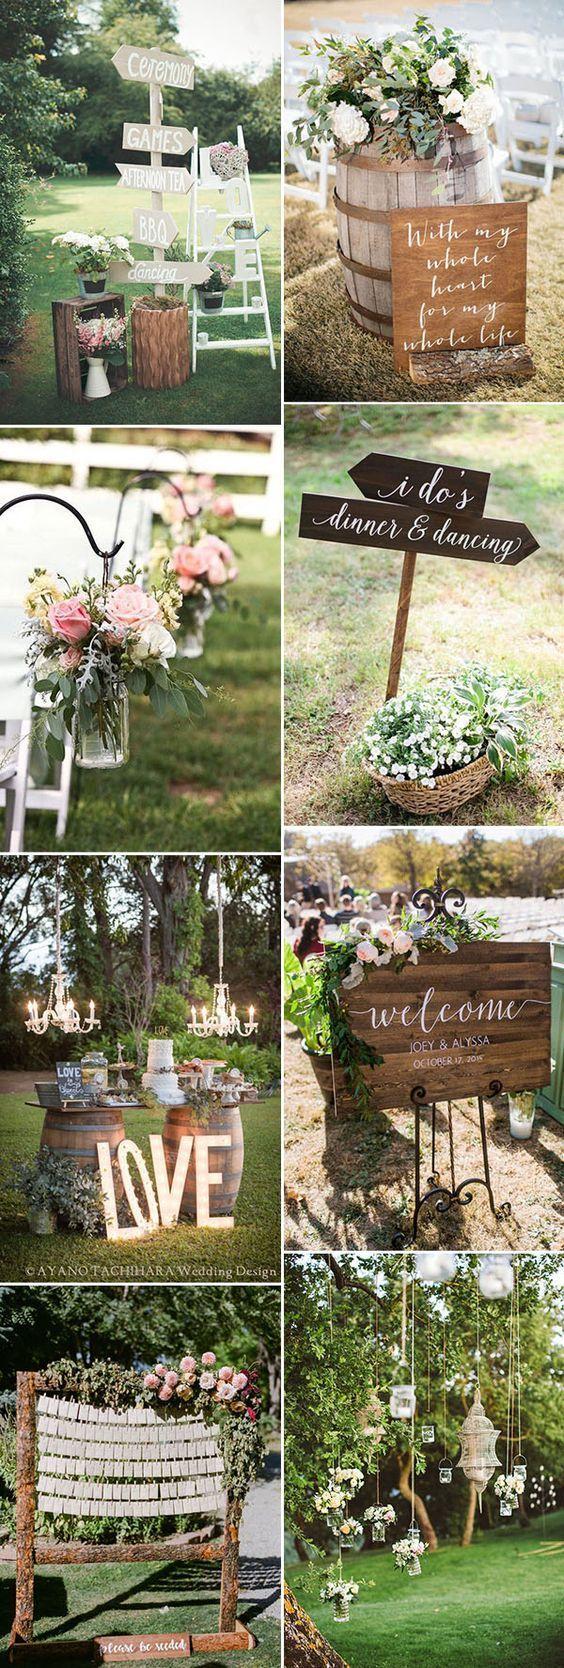 amazing garden wedding decor ideas that are easy to DIY  Outdoor